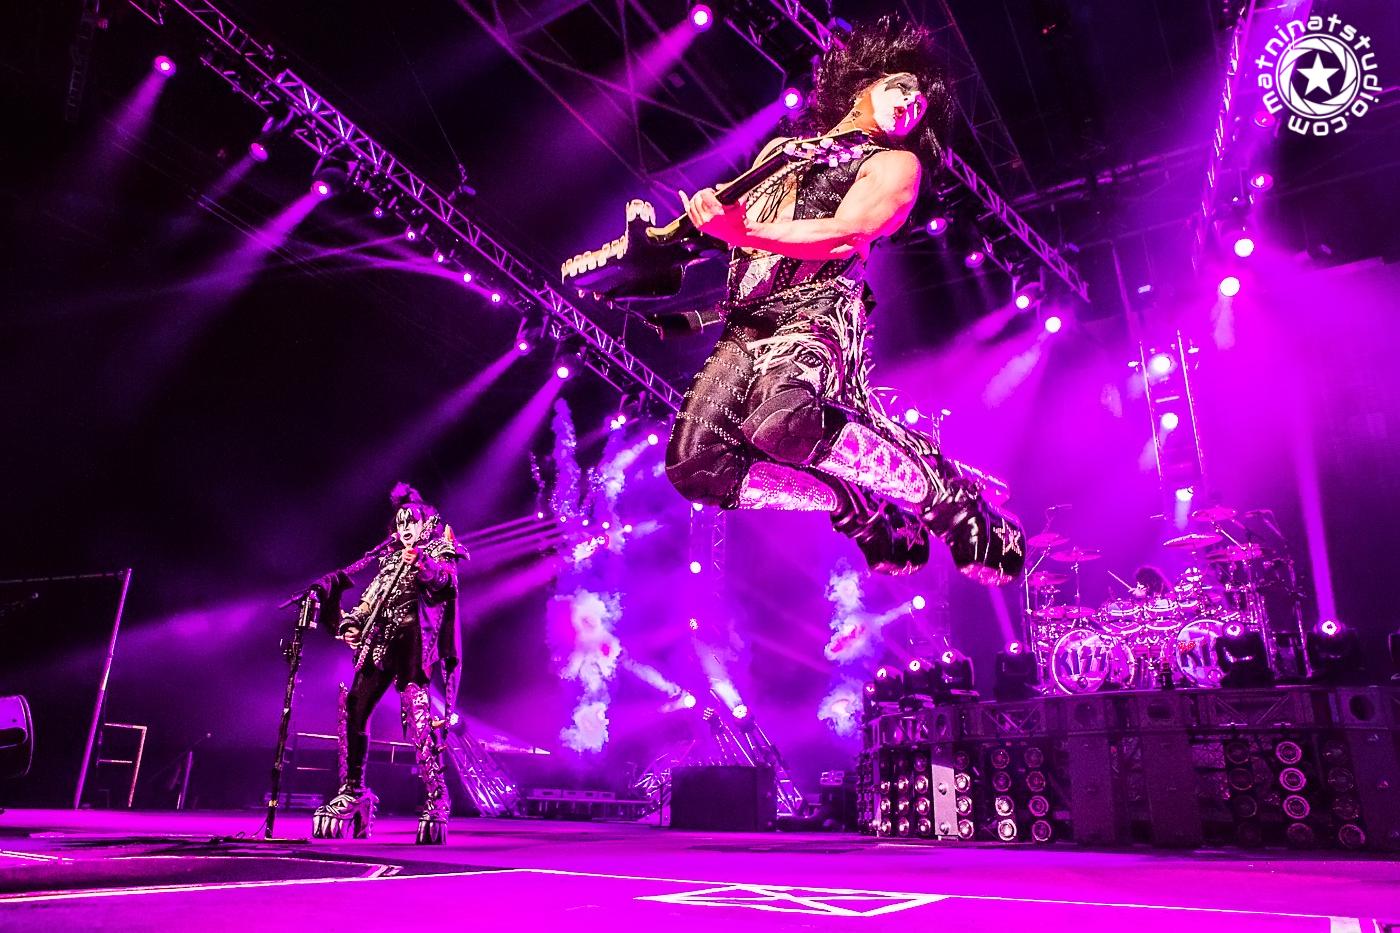 Kiss live @ Zénith Paris France. June 16th 2015. World Tour. Paul Stanley, Gene Simmons, Tommy Thayer, Eric Singer. © Mat Ninat Studio | Film & TV director | Photographer | Musician